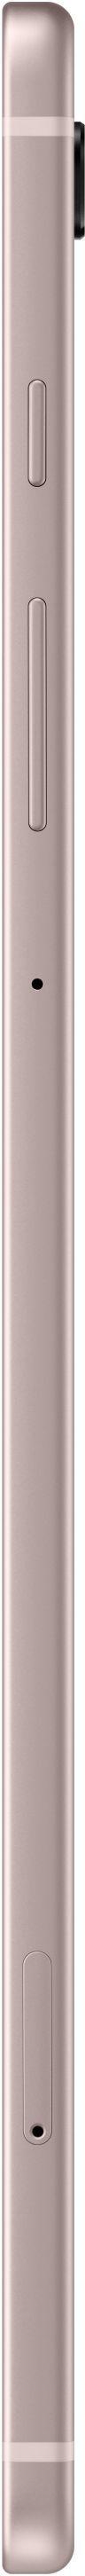 Планшет Samsung Galaxy Tab S6 Lite Wi-Fi 64GB (SM-P610NZIASEK) Pink от Територія твоєї техніки - 4